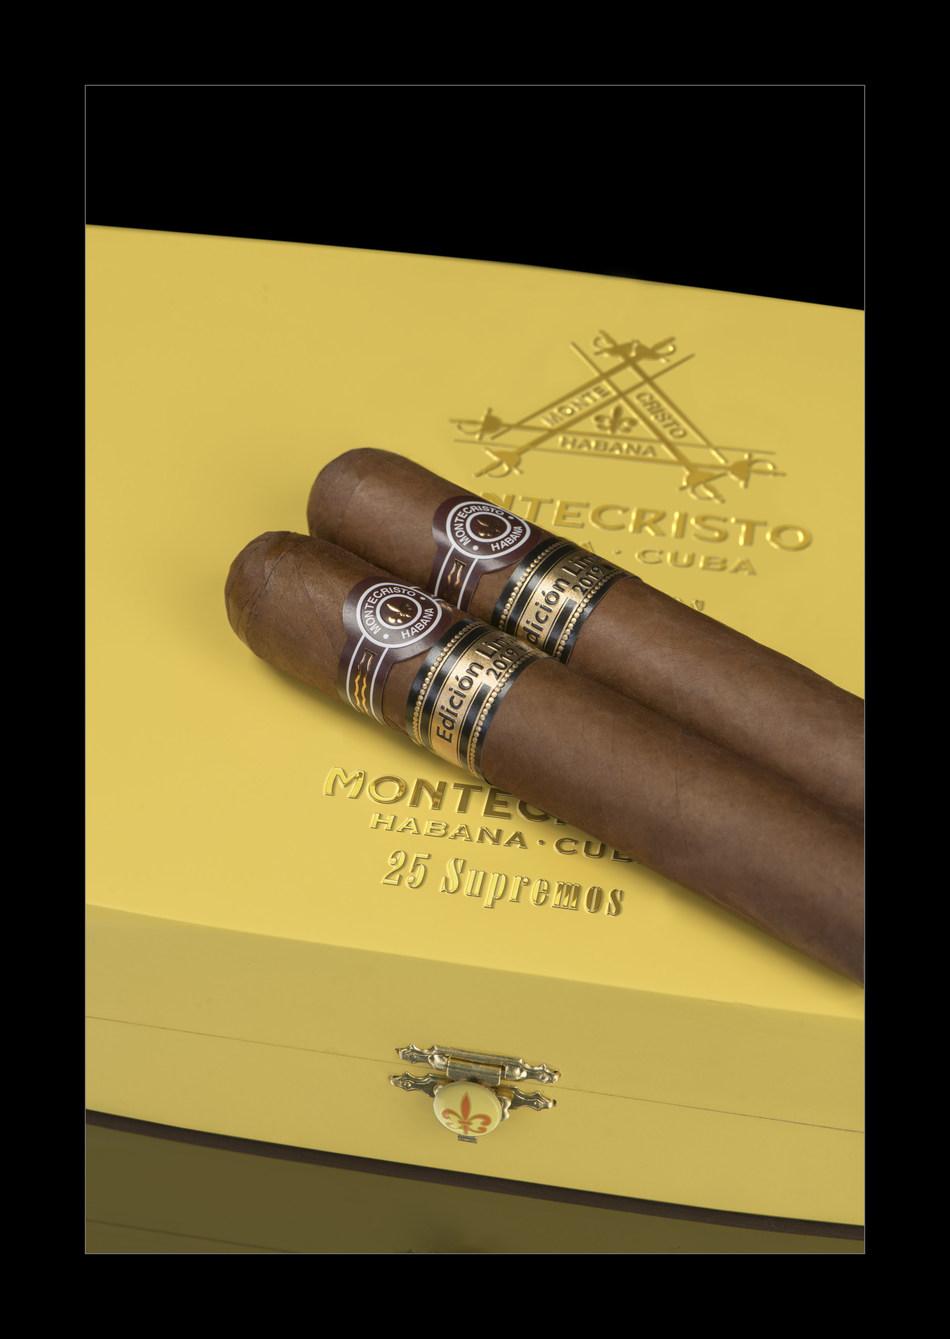 Montecristo Supremos box and habanos